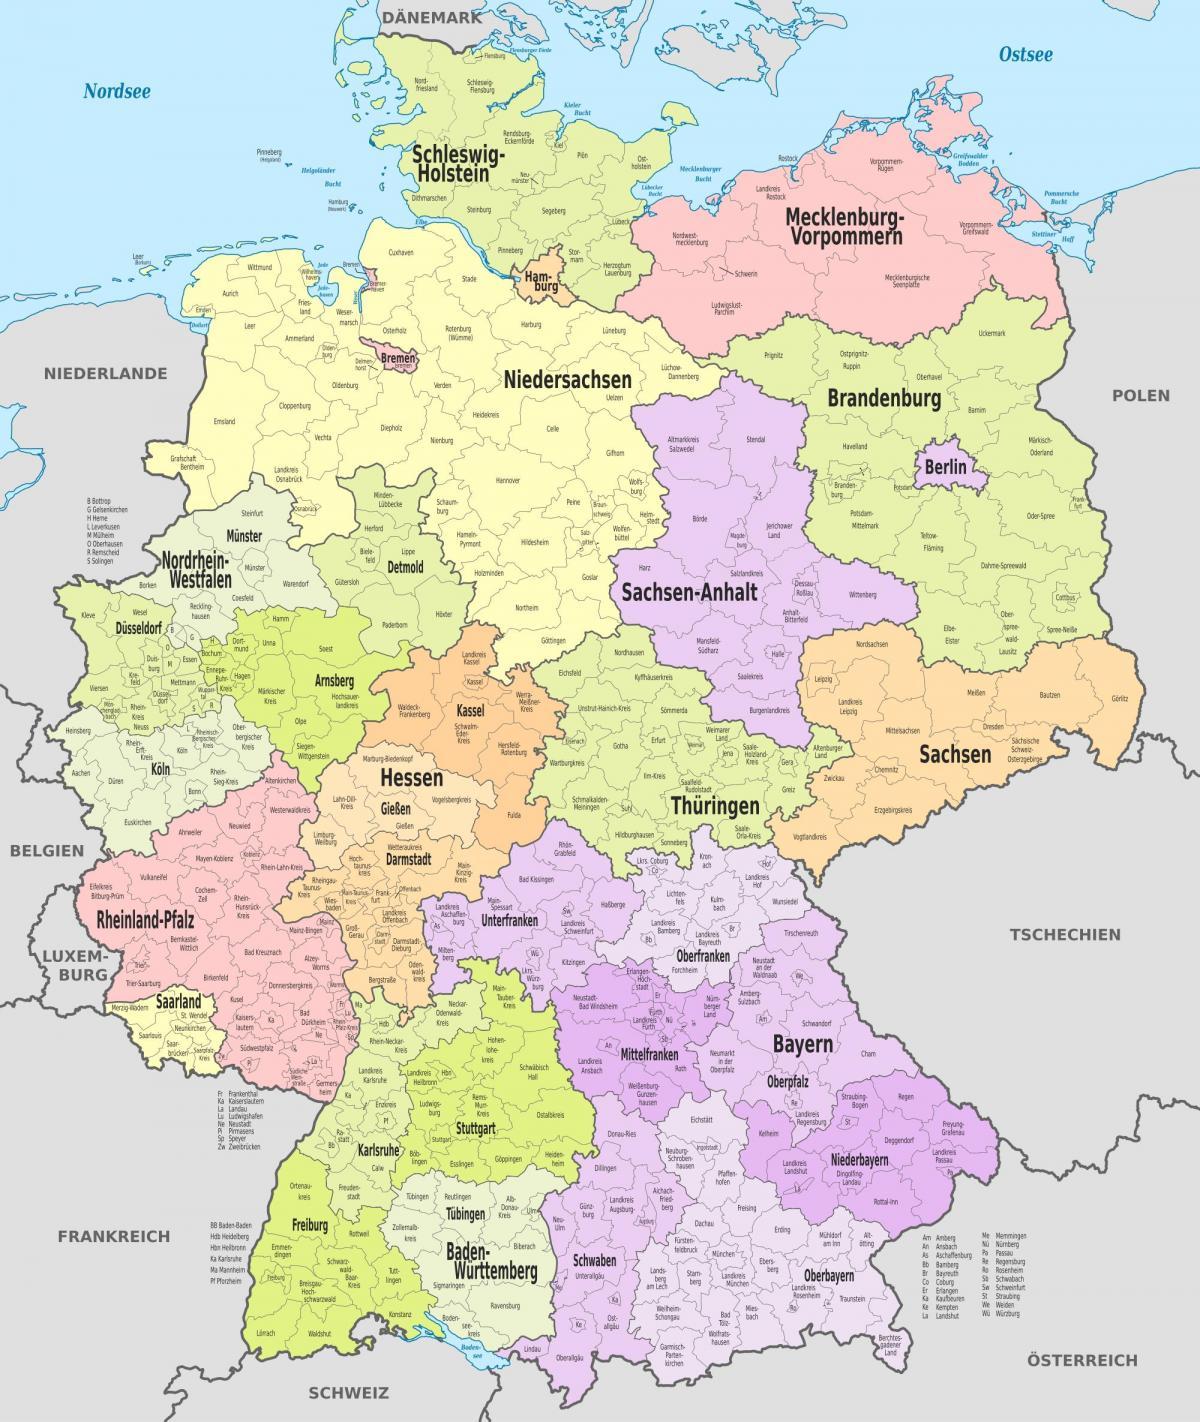 dresden karta Njemačka karta područja kartica području Njemačke (Zapadna Europa  dresden karta